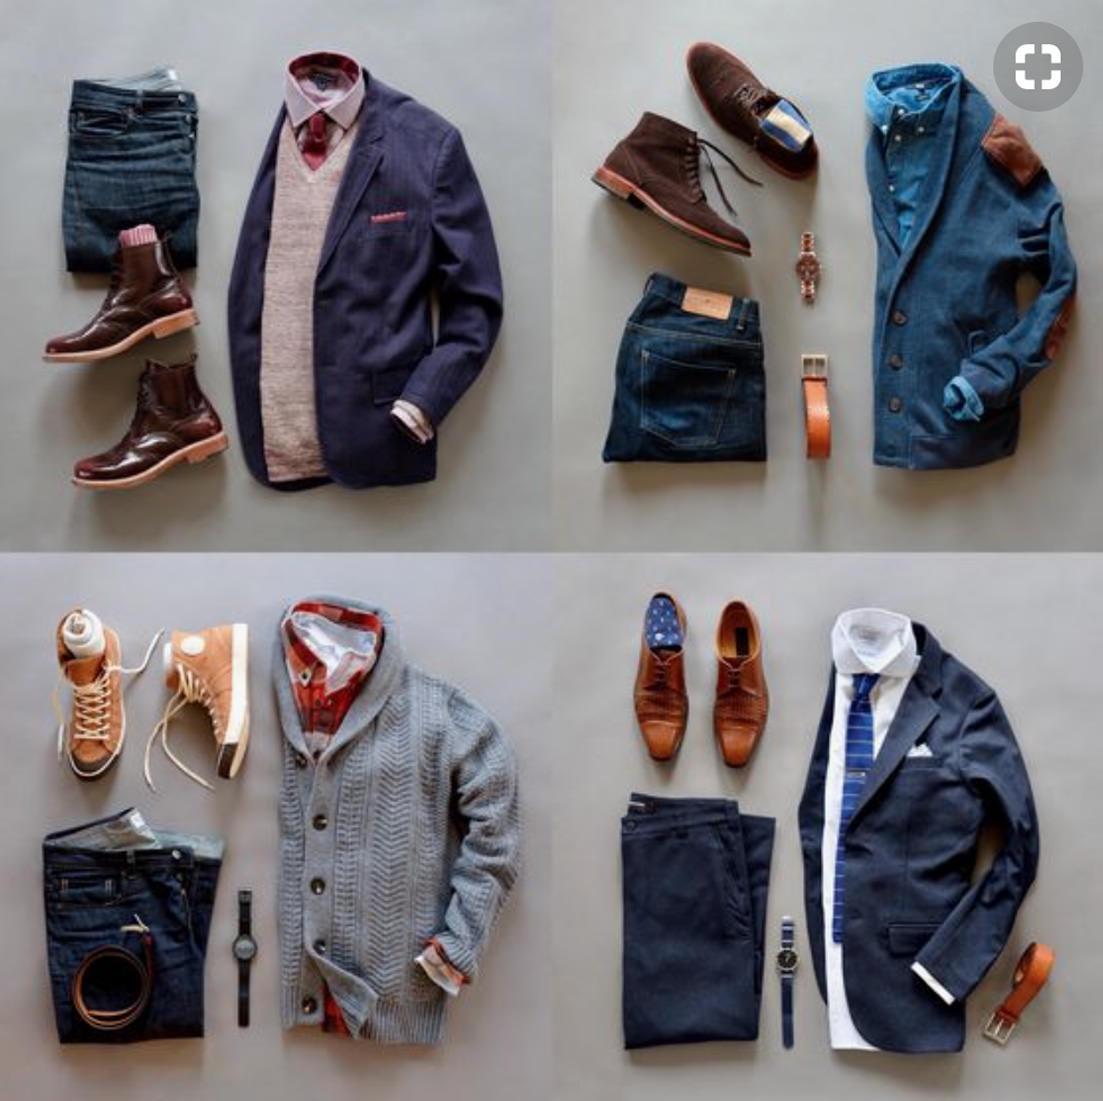 mens-outfit-set-5.jpg